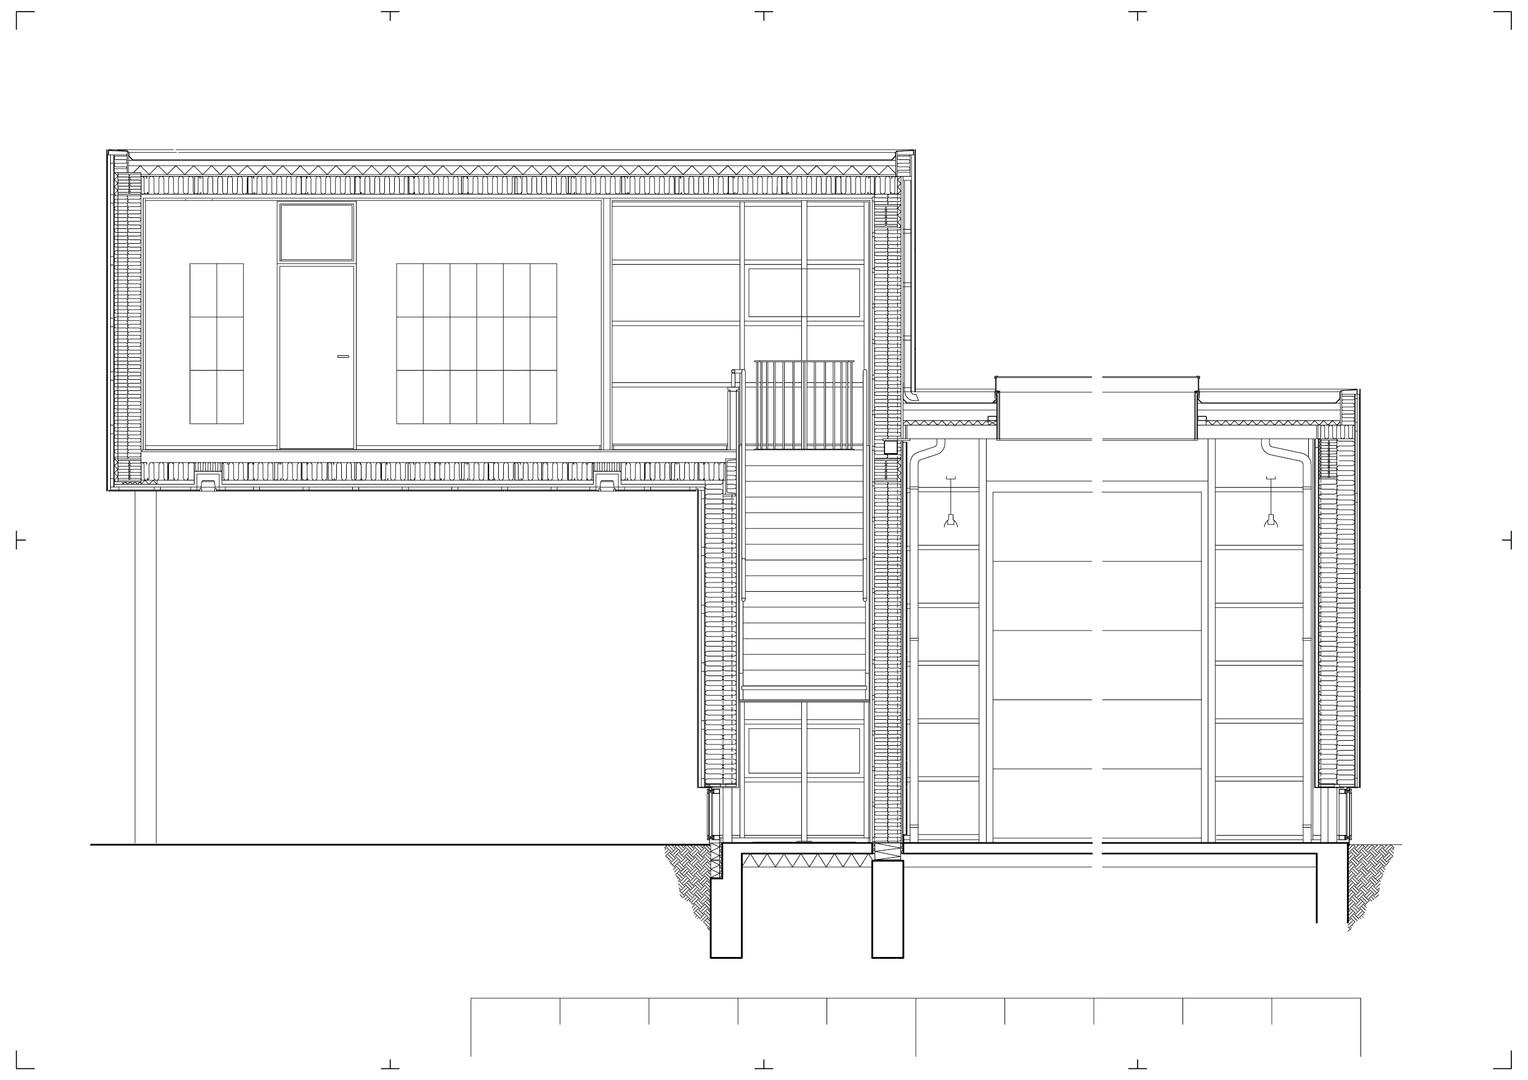 brandstation02.jpg